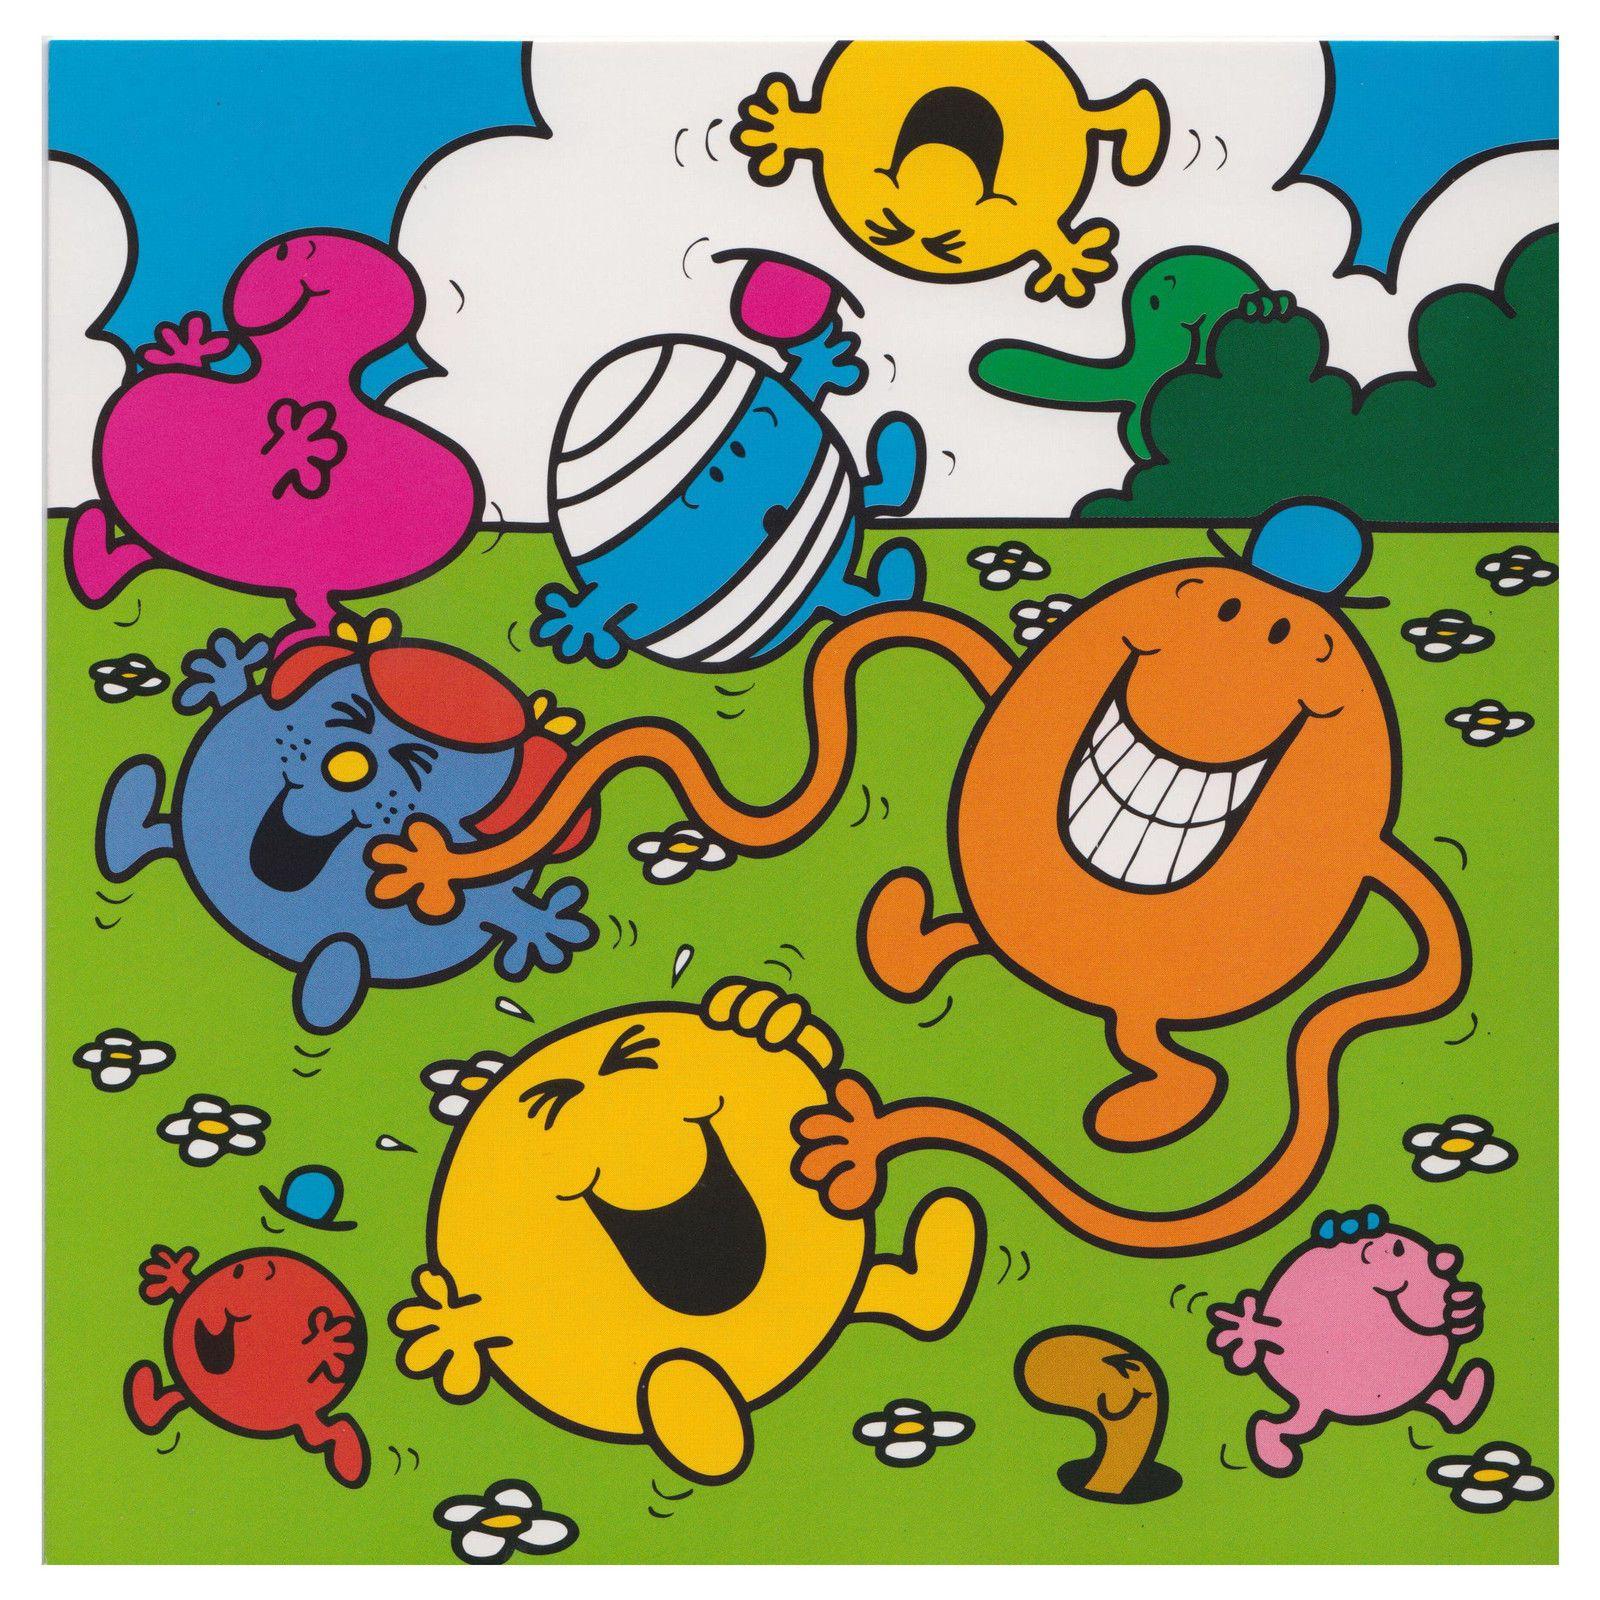 3 95 Gbp Mr Men Little Miss Characters Greeting Card Mr Happy Mr Greedy Mr Bump Birthday Ebay Home Garden Mr Men Little Miss Mr Men Little Miss